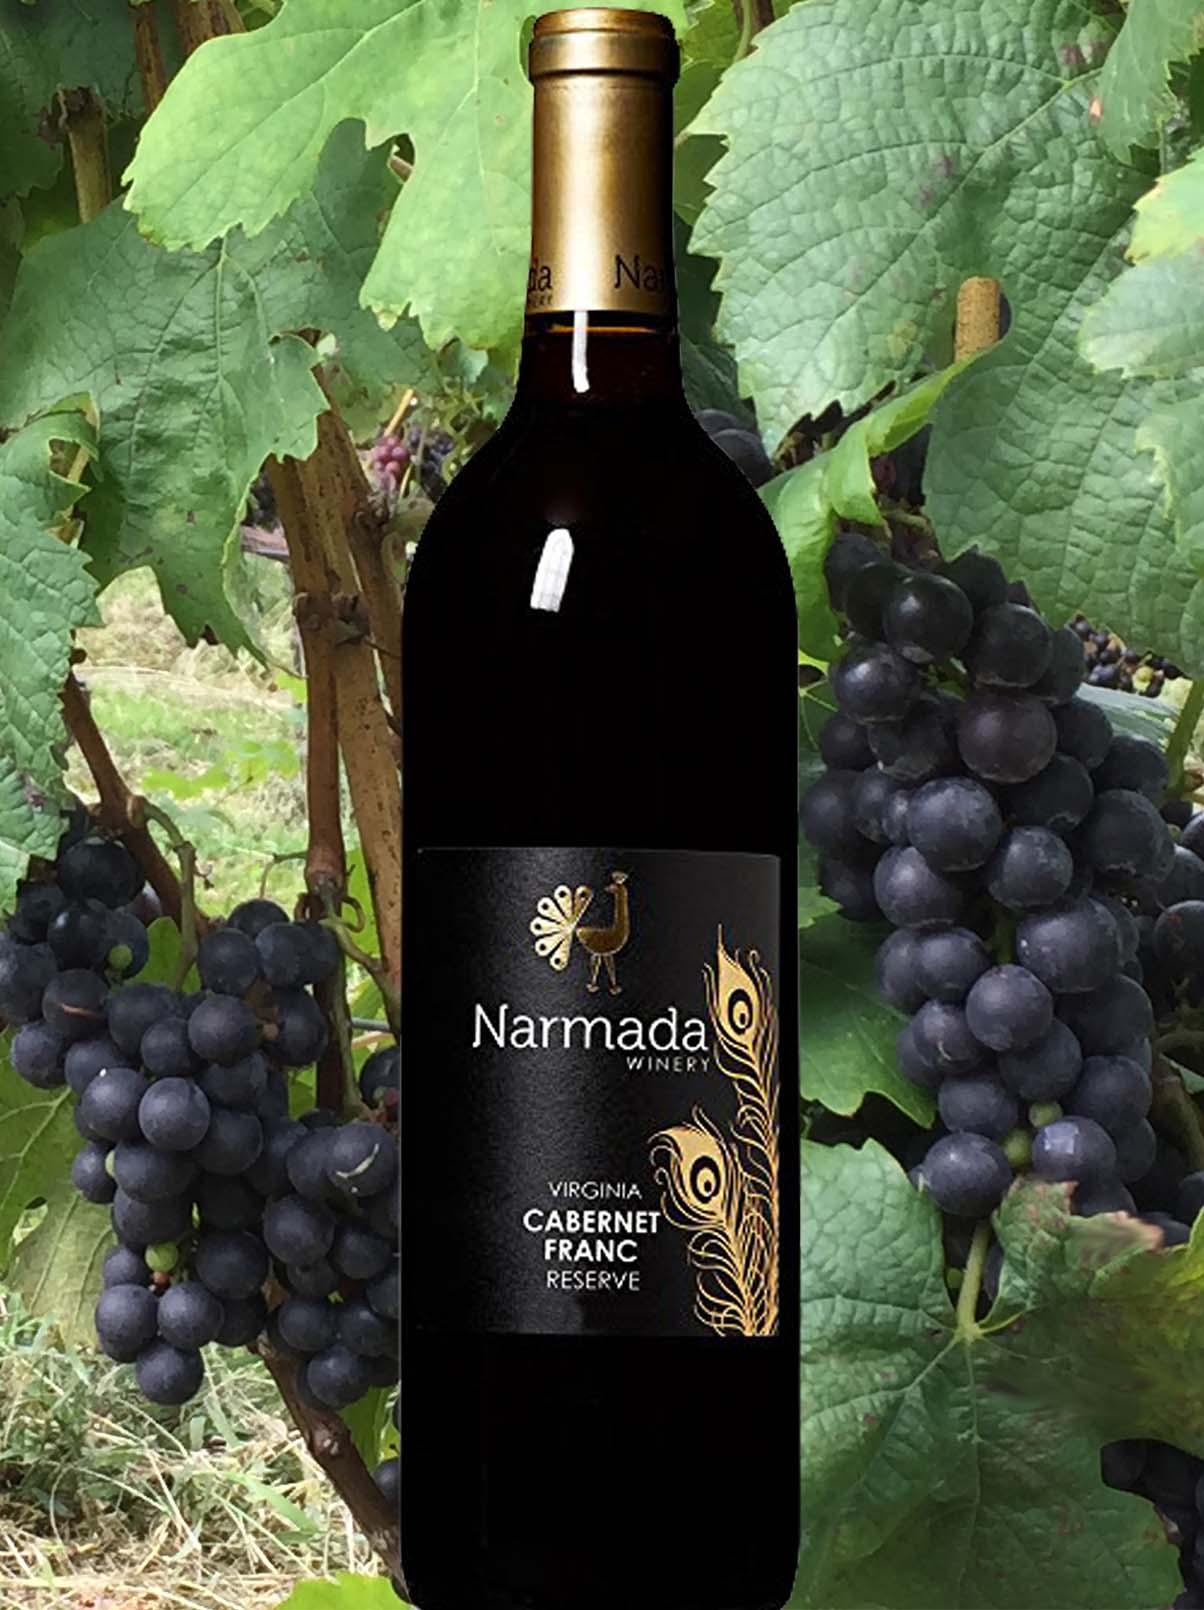 Narmada Winery, Cabernet Franc